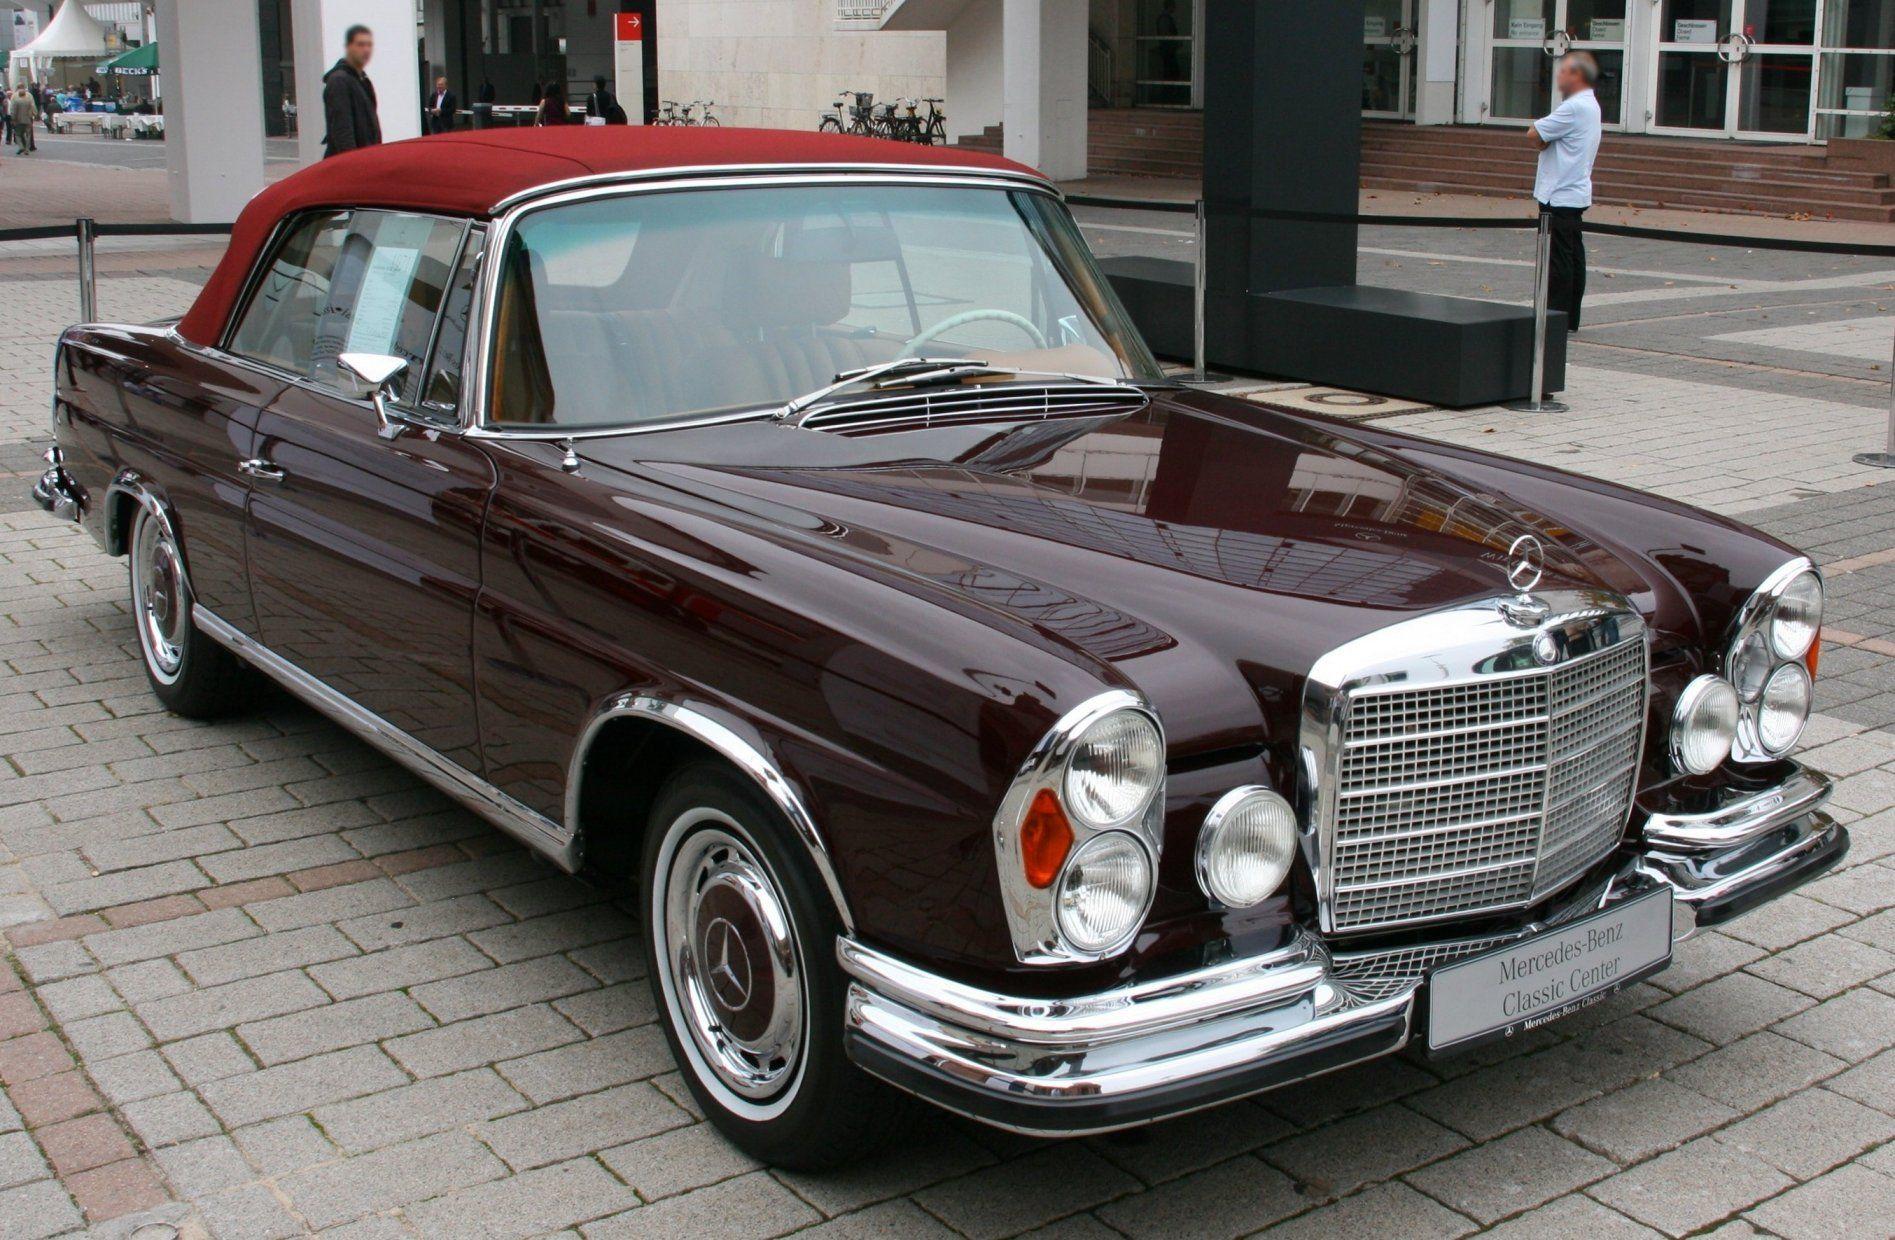 1961 Mercedes-Benz W111 (280 SE 3.5) Cabrio